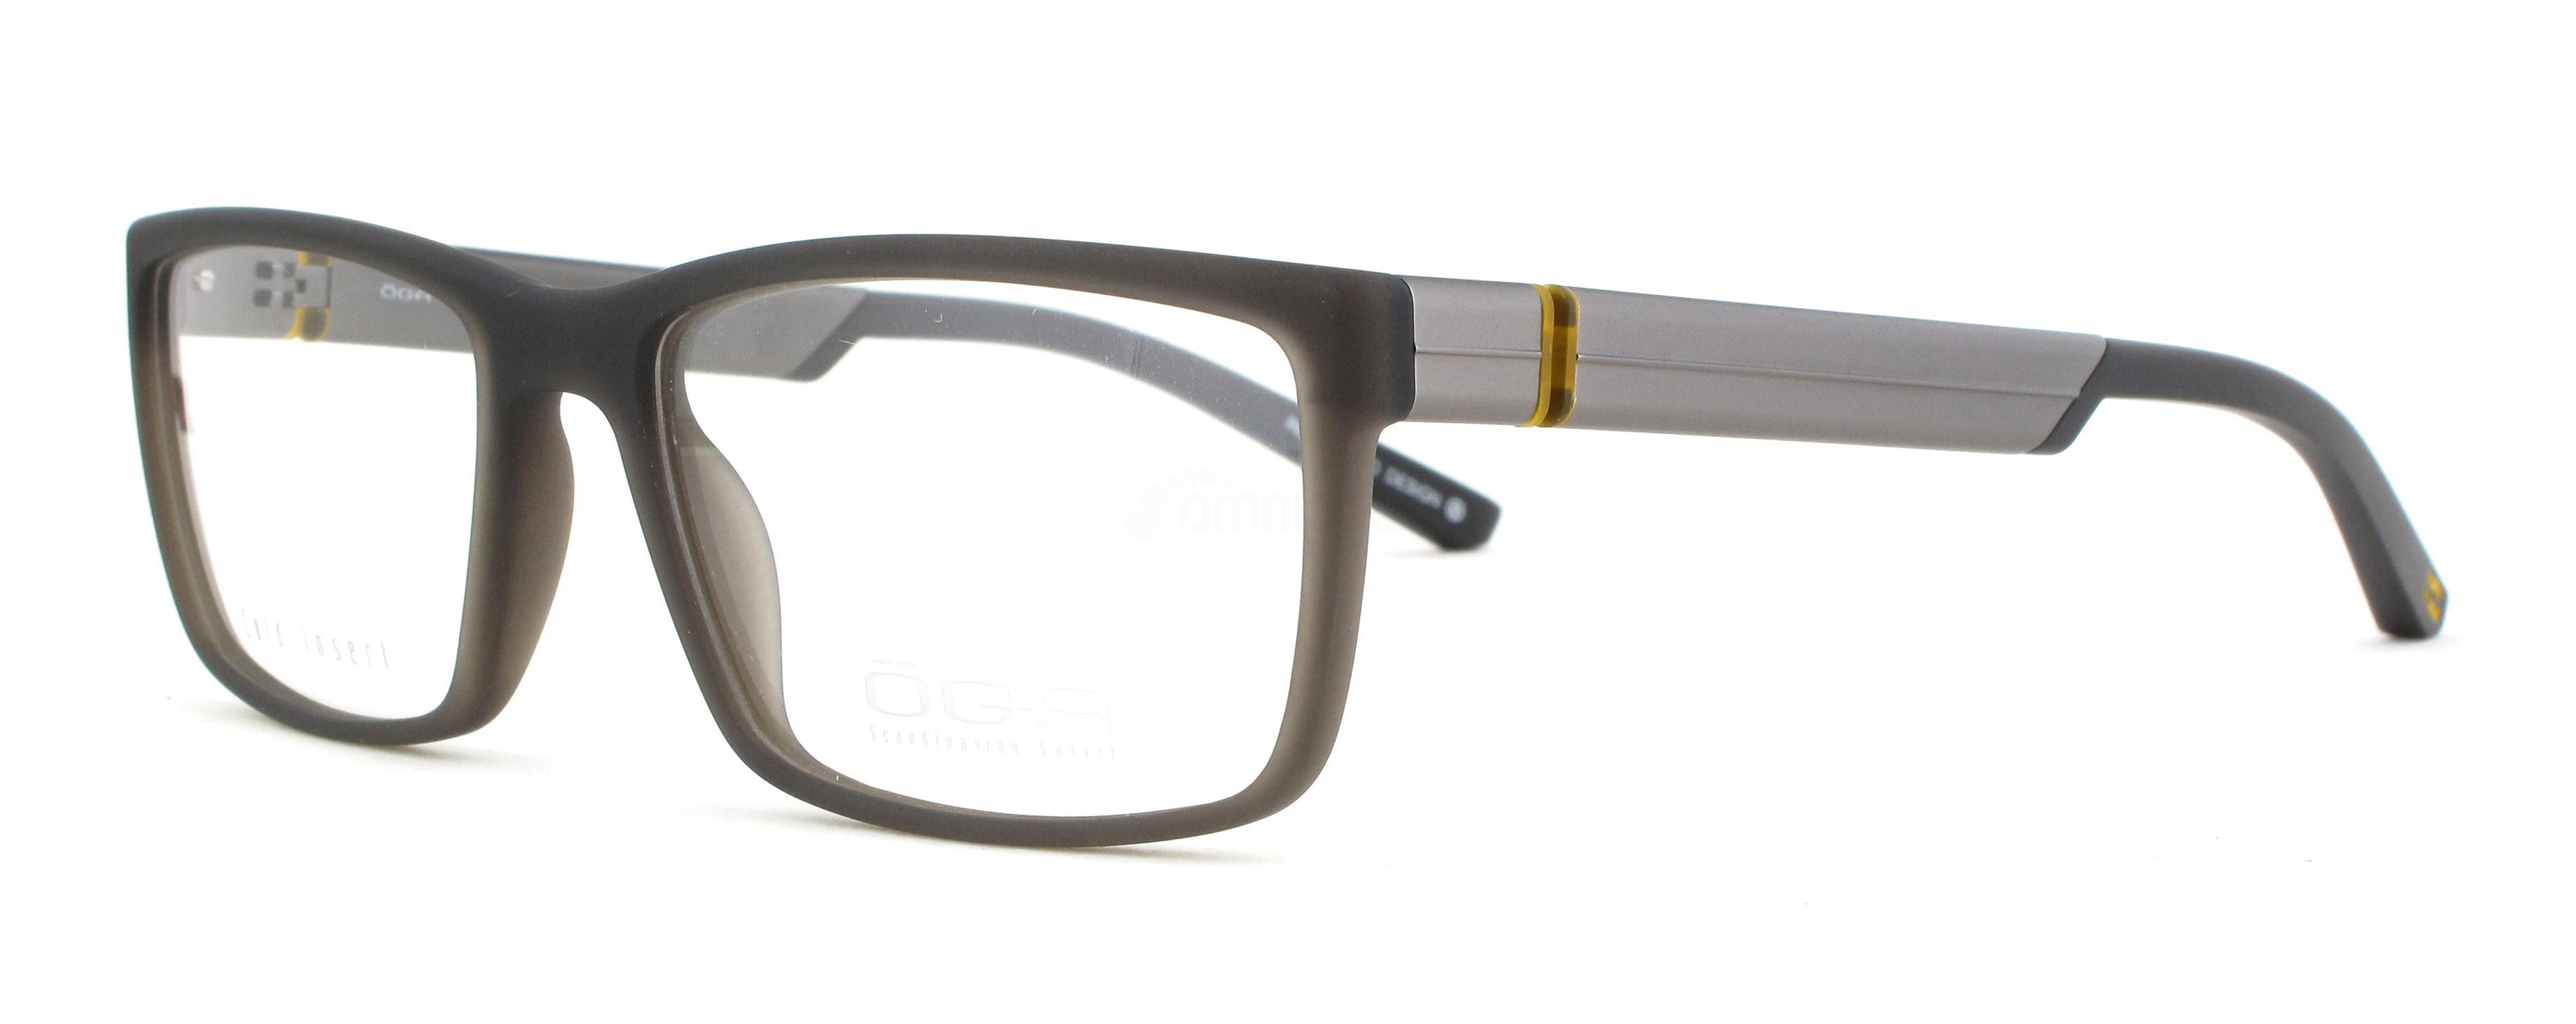 GG032 7651O AVLANG 1 Glasses, ÖGA Scandinavian Spirit